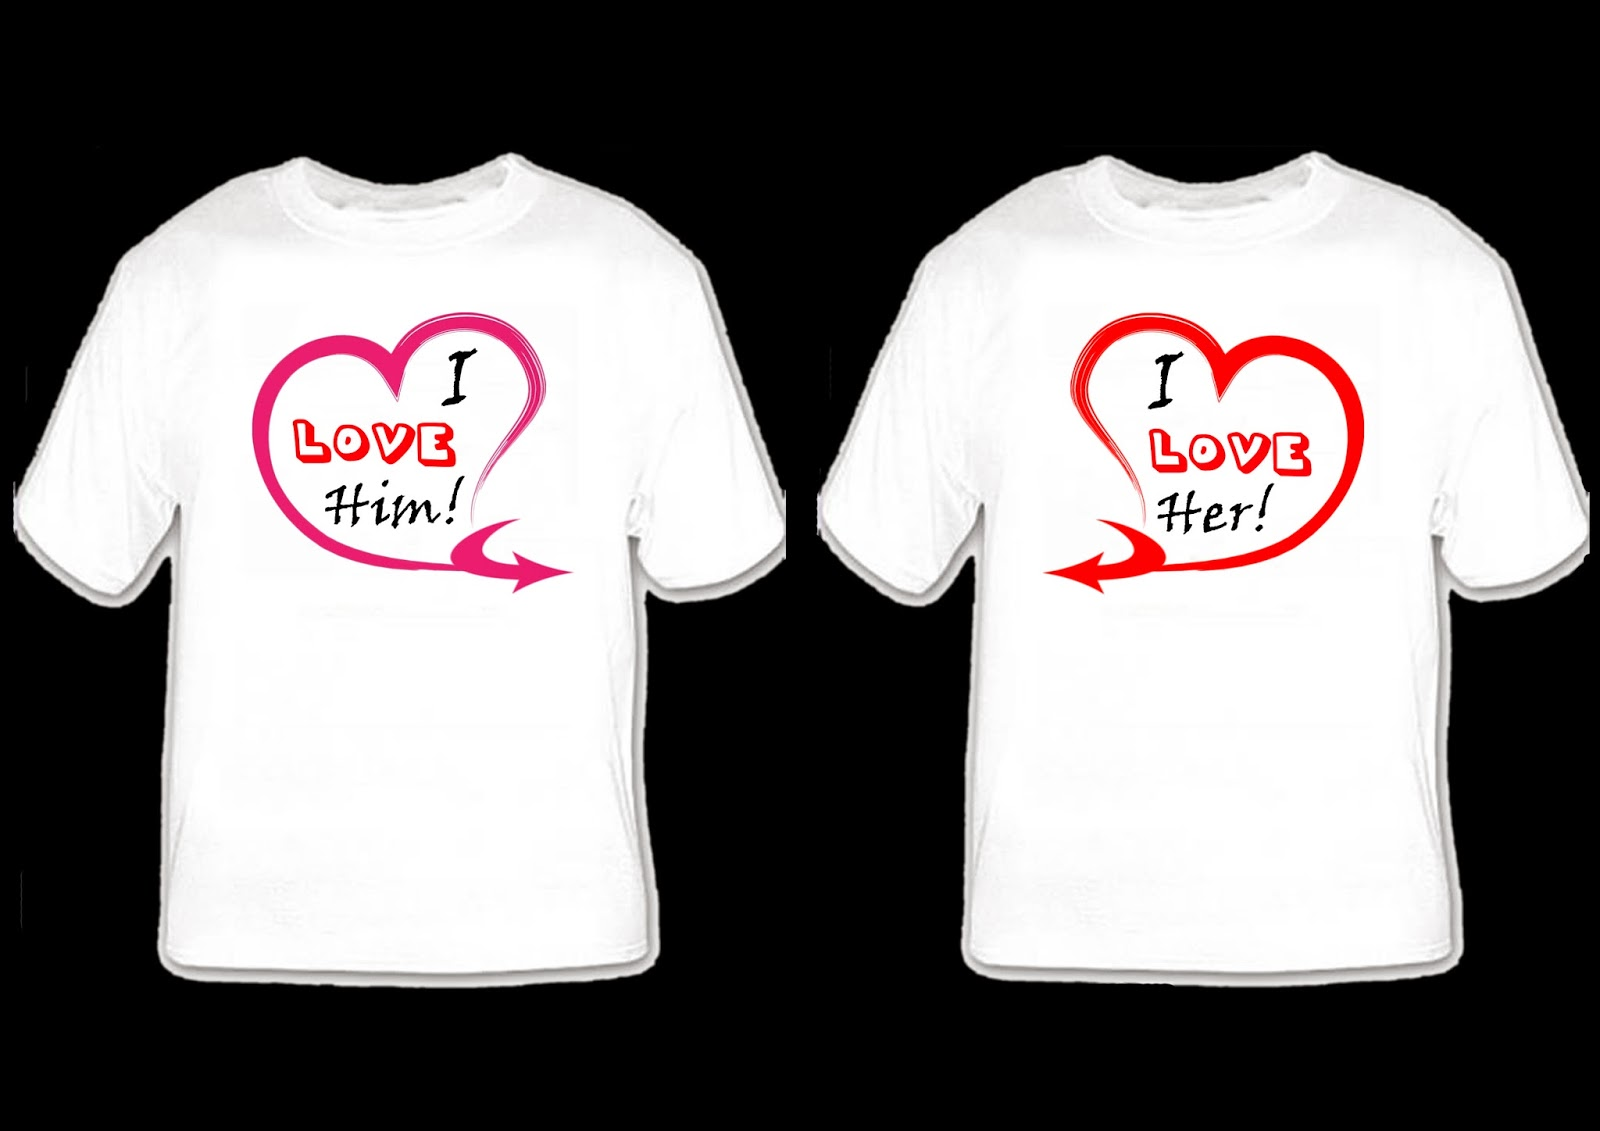 Couple Shirts Design | Joy Studio Design Gallery - Best Design